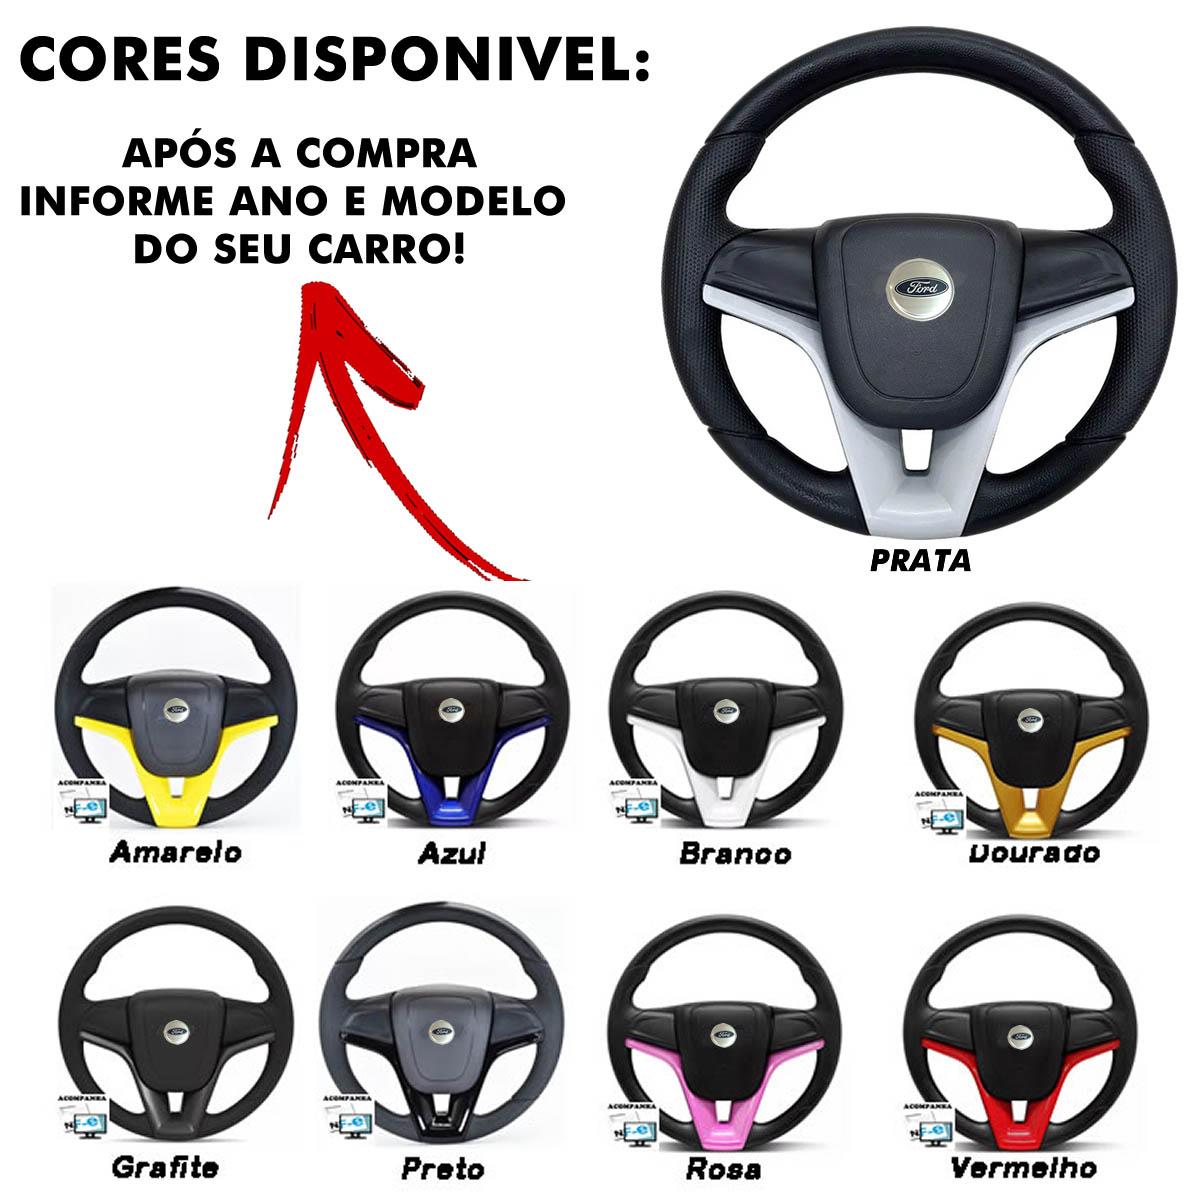 Volante Ford Cruze Esportivo Cubo Fiesta Ka Ecosport Escort Hobby Zetec F100 F1000 F75 F250 Poliparts